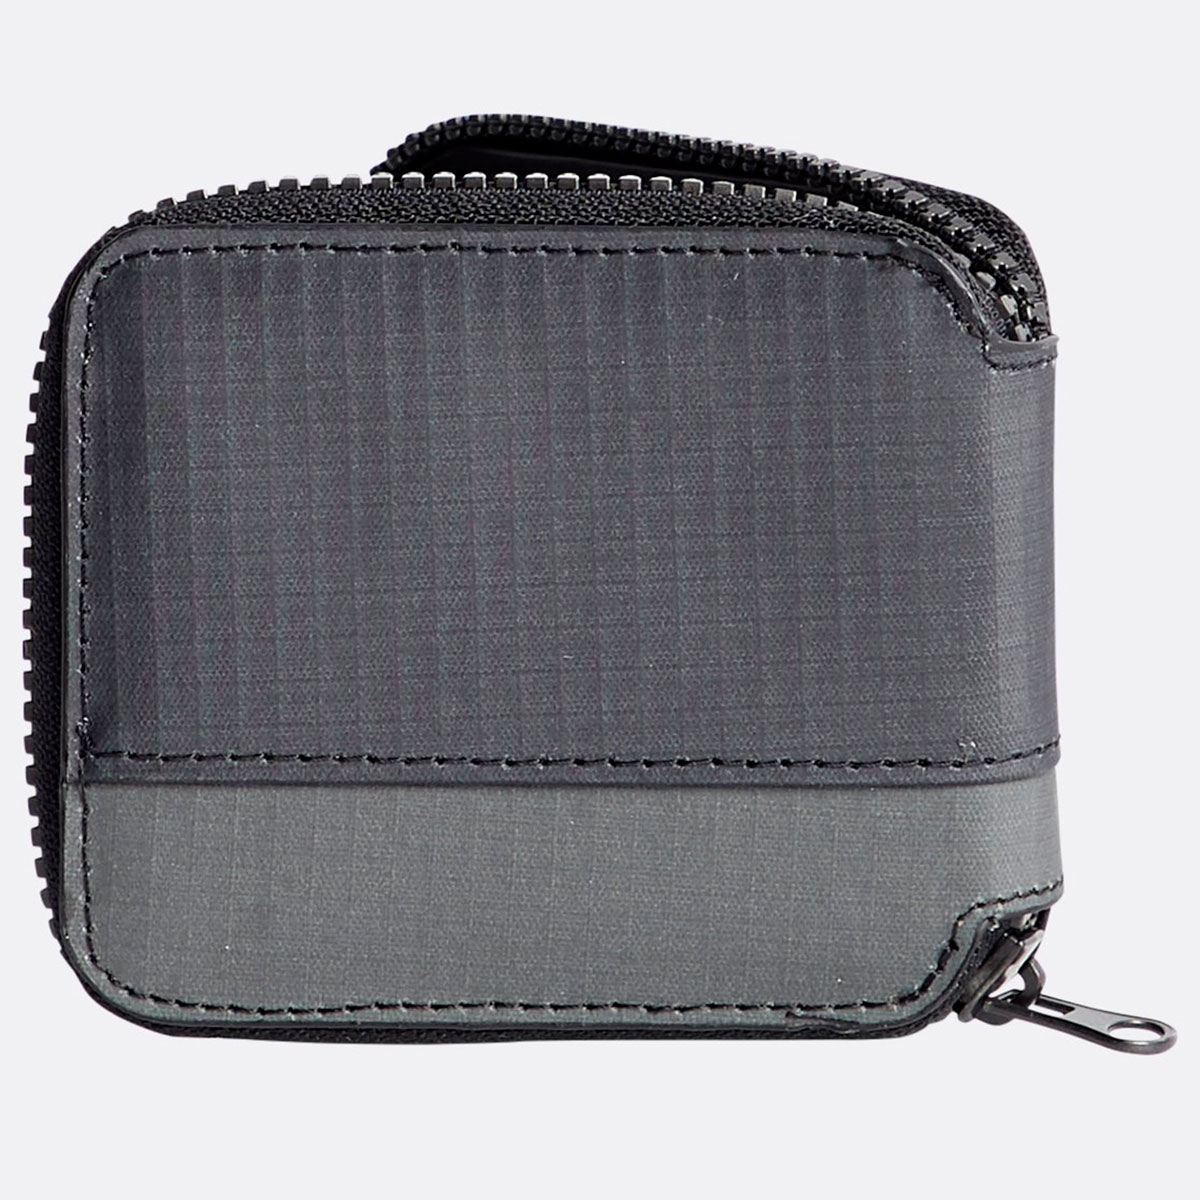 Кошелек Billabong Trek Wallet Black